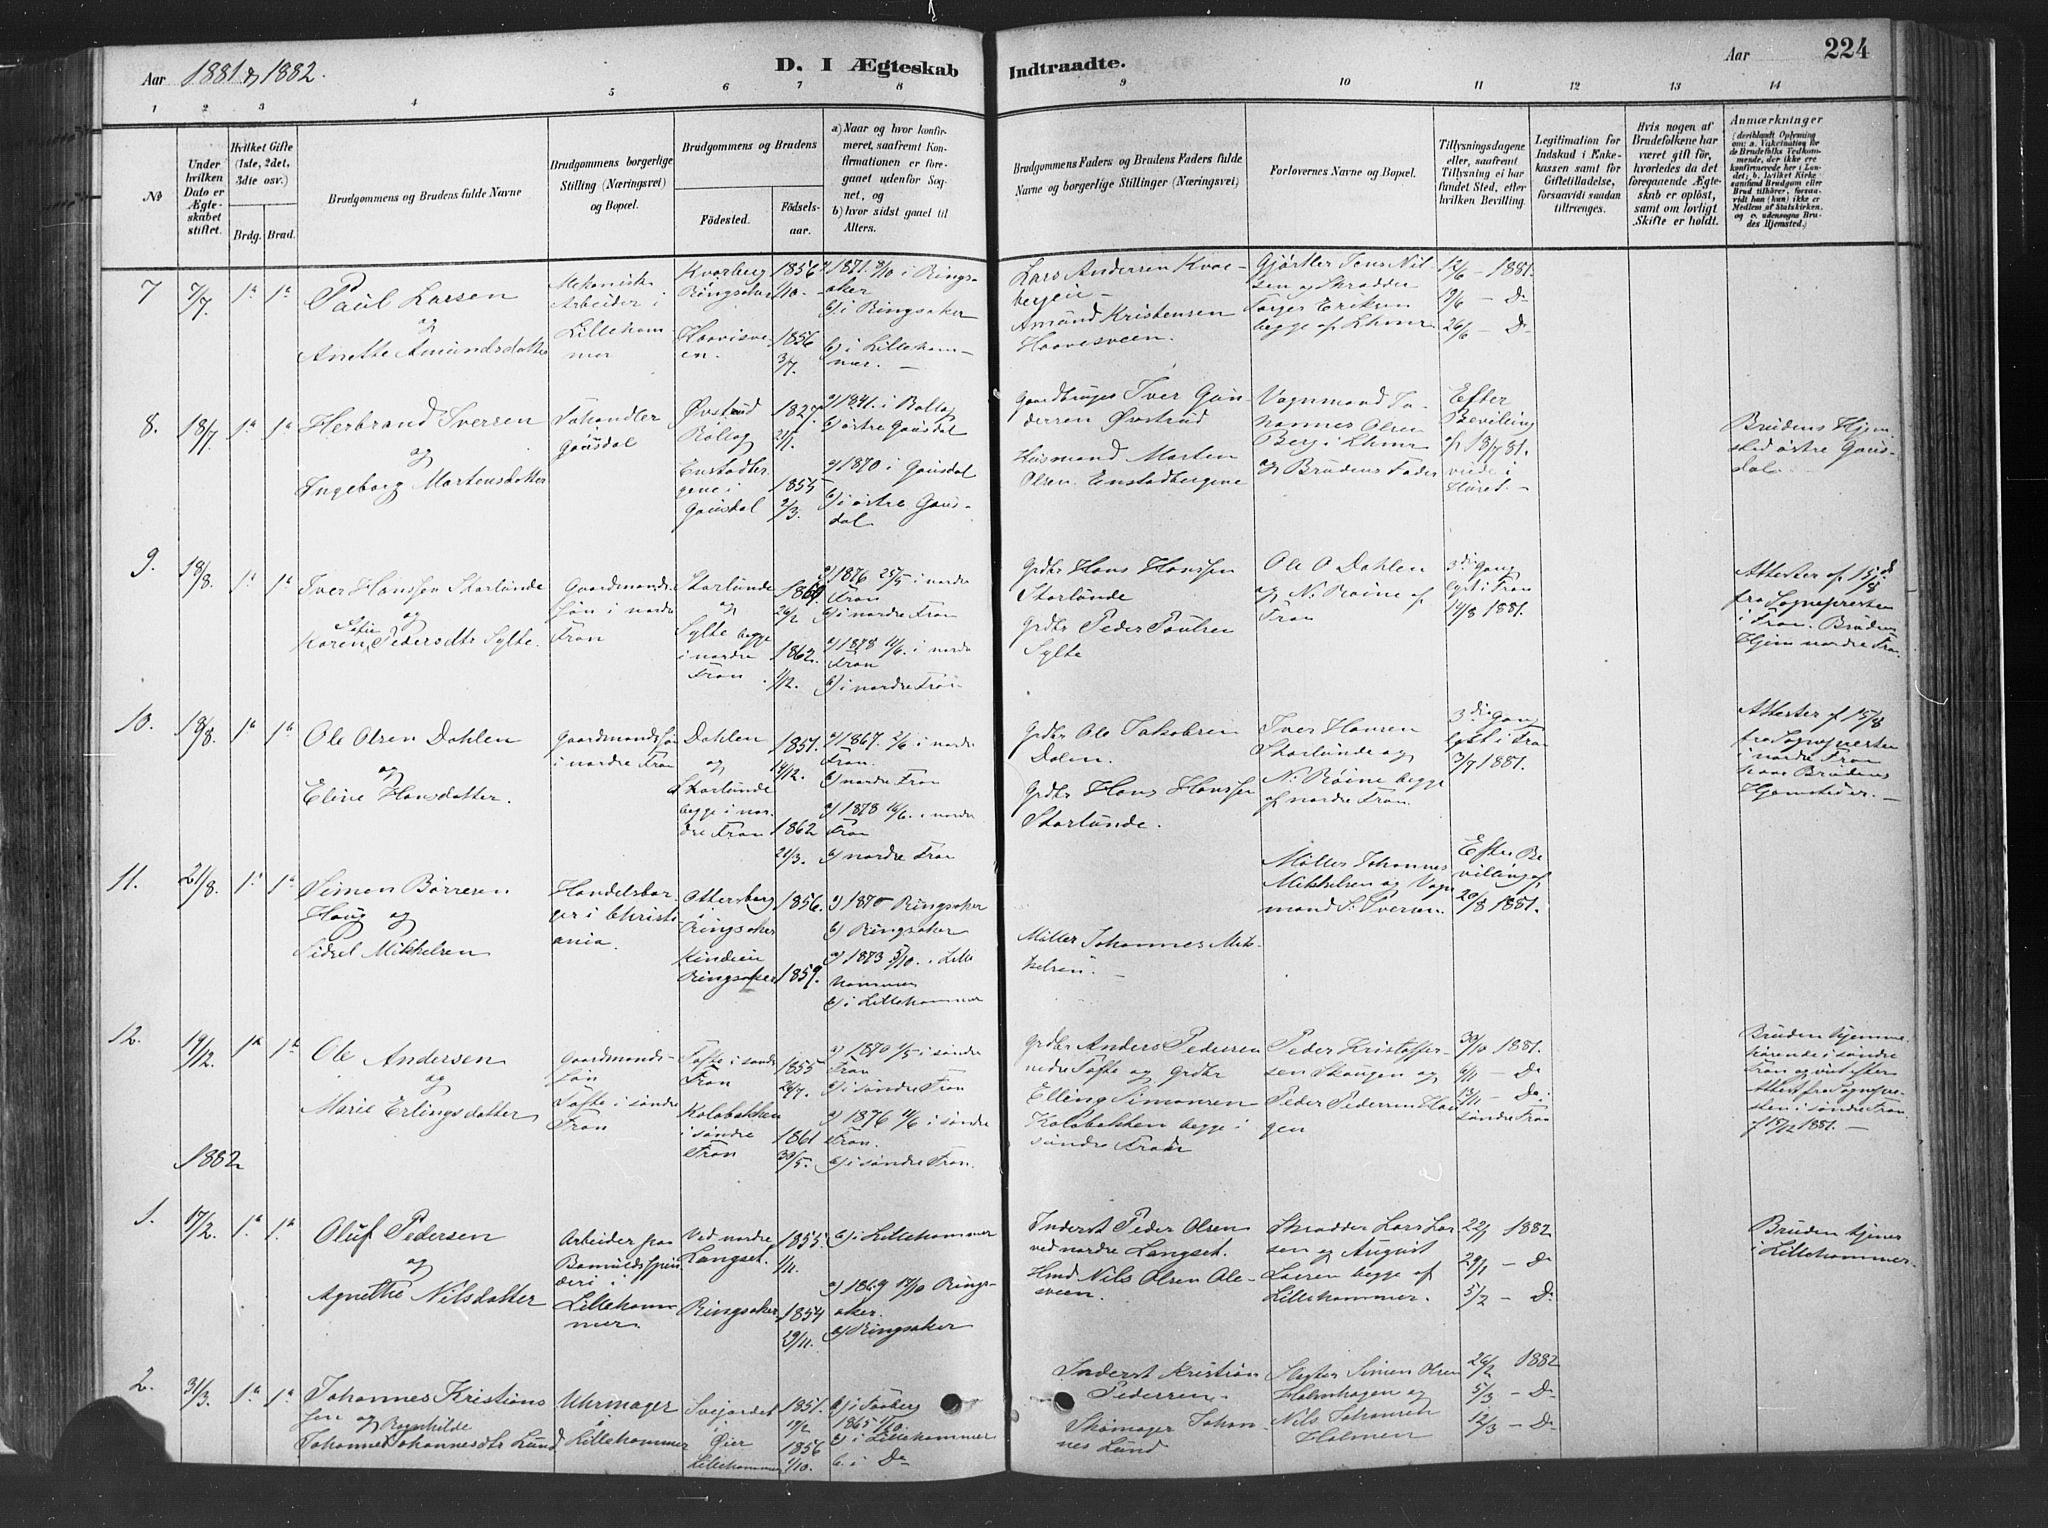 SAH, Fåberg prestekontor, Ministerialbok nr. 10, 1879-1900, s. 224